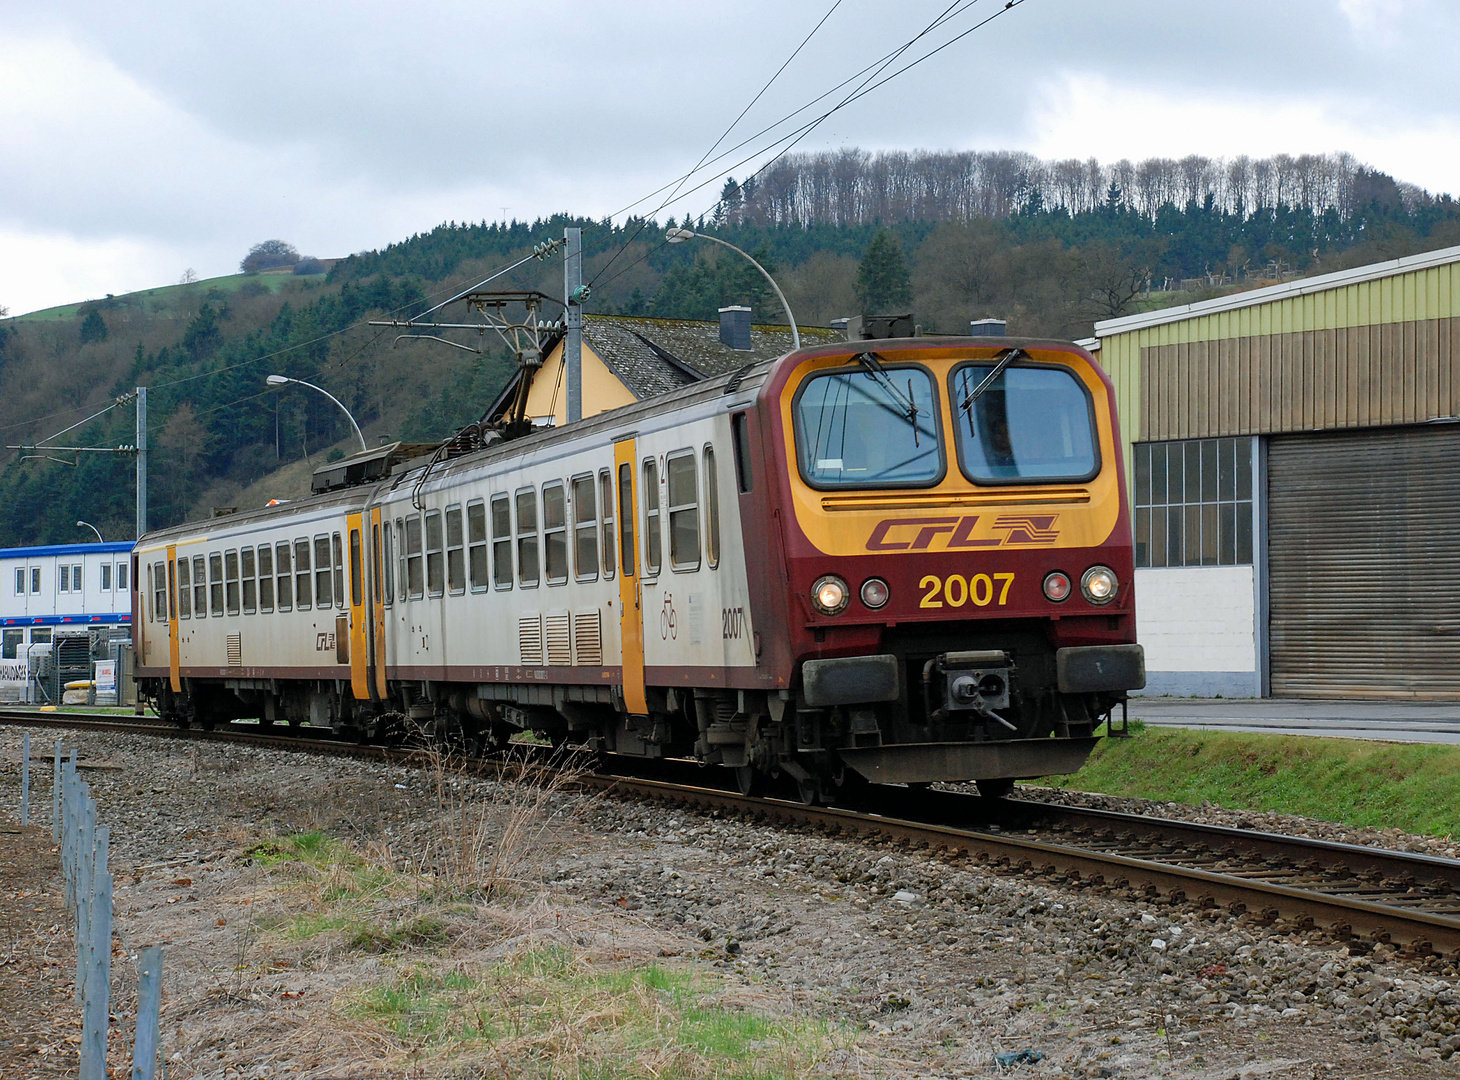 CFL 2007